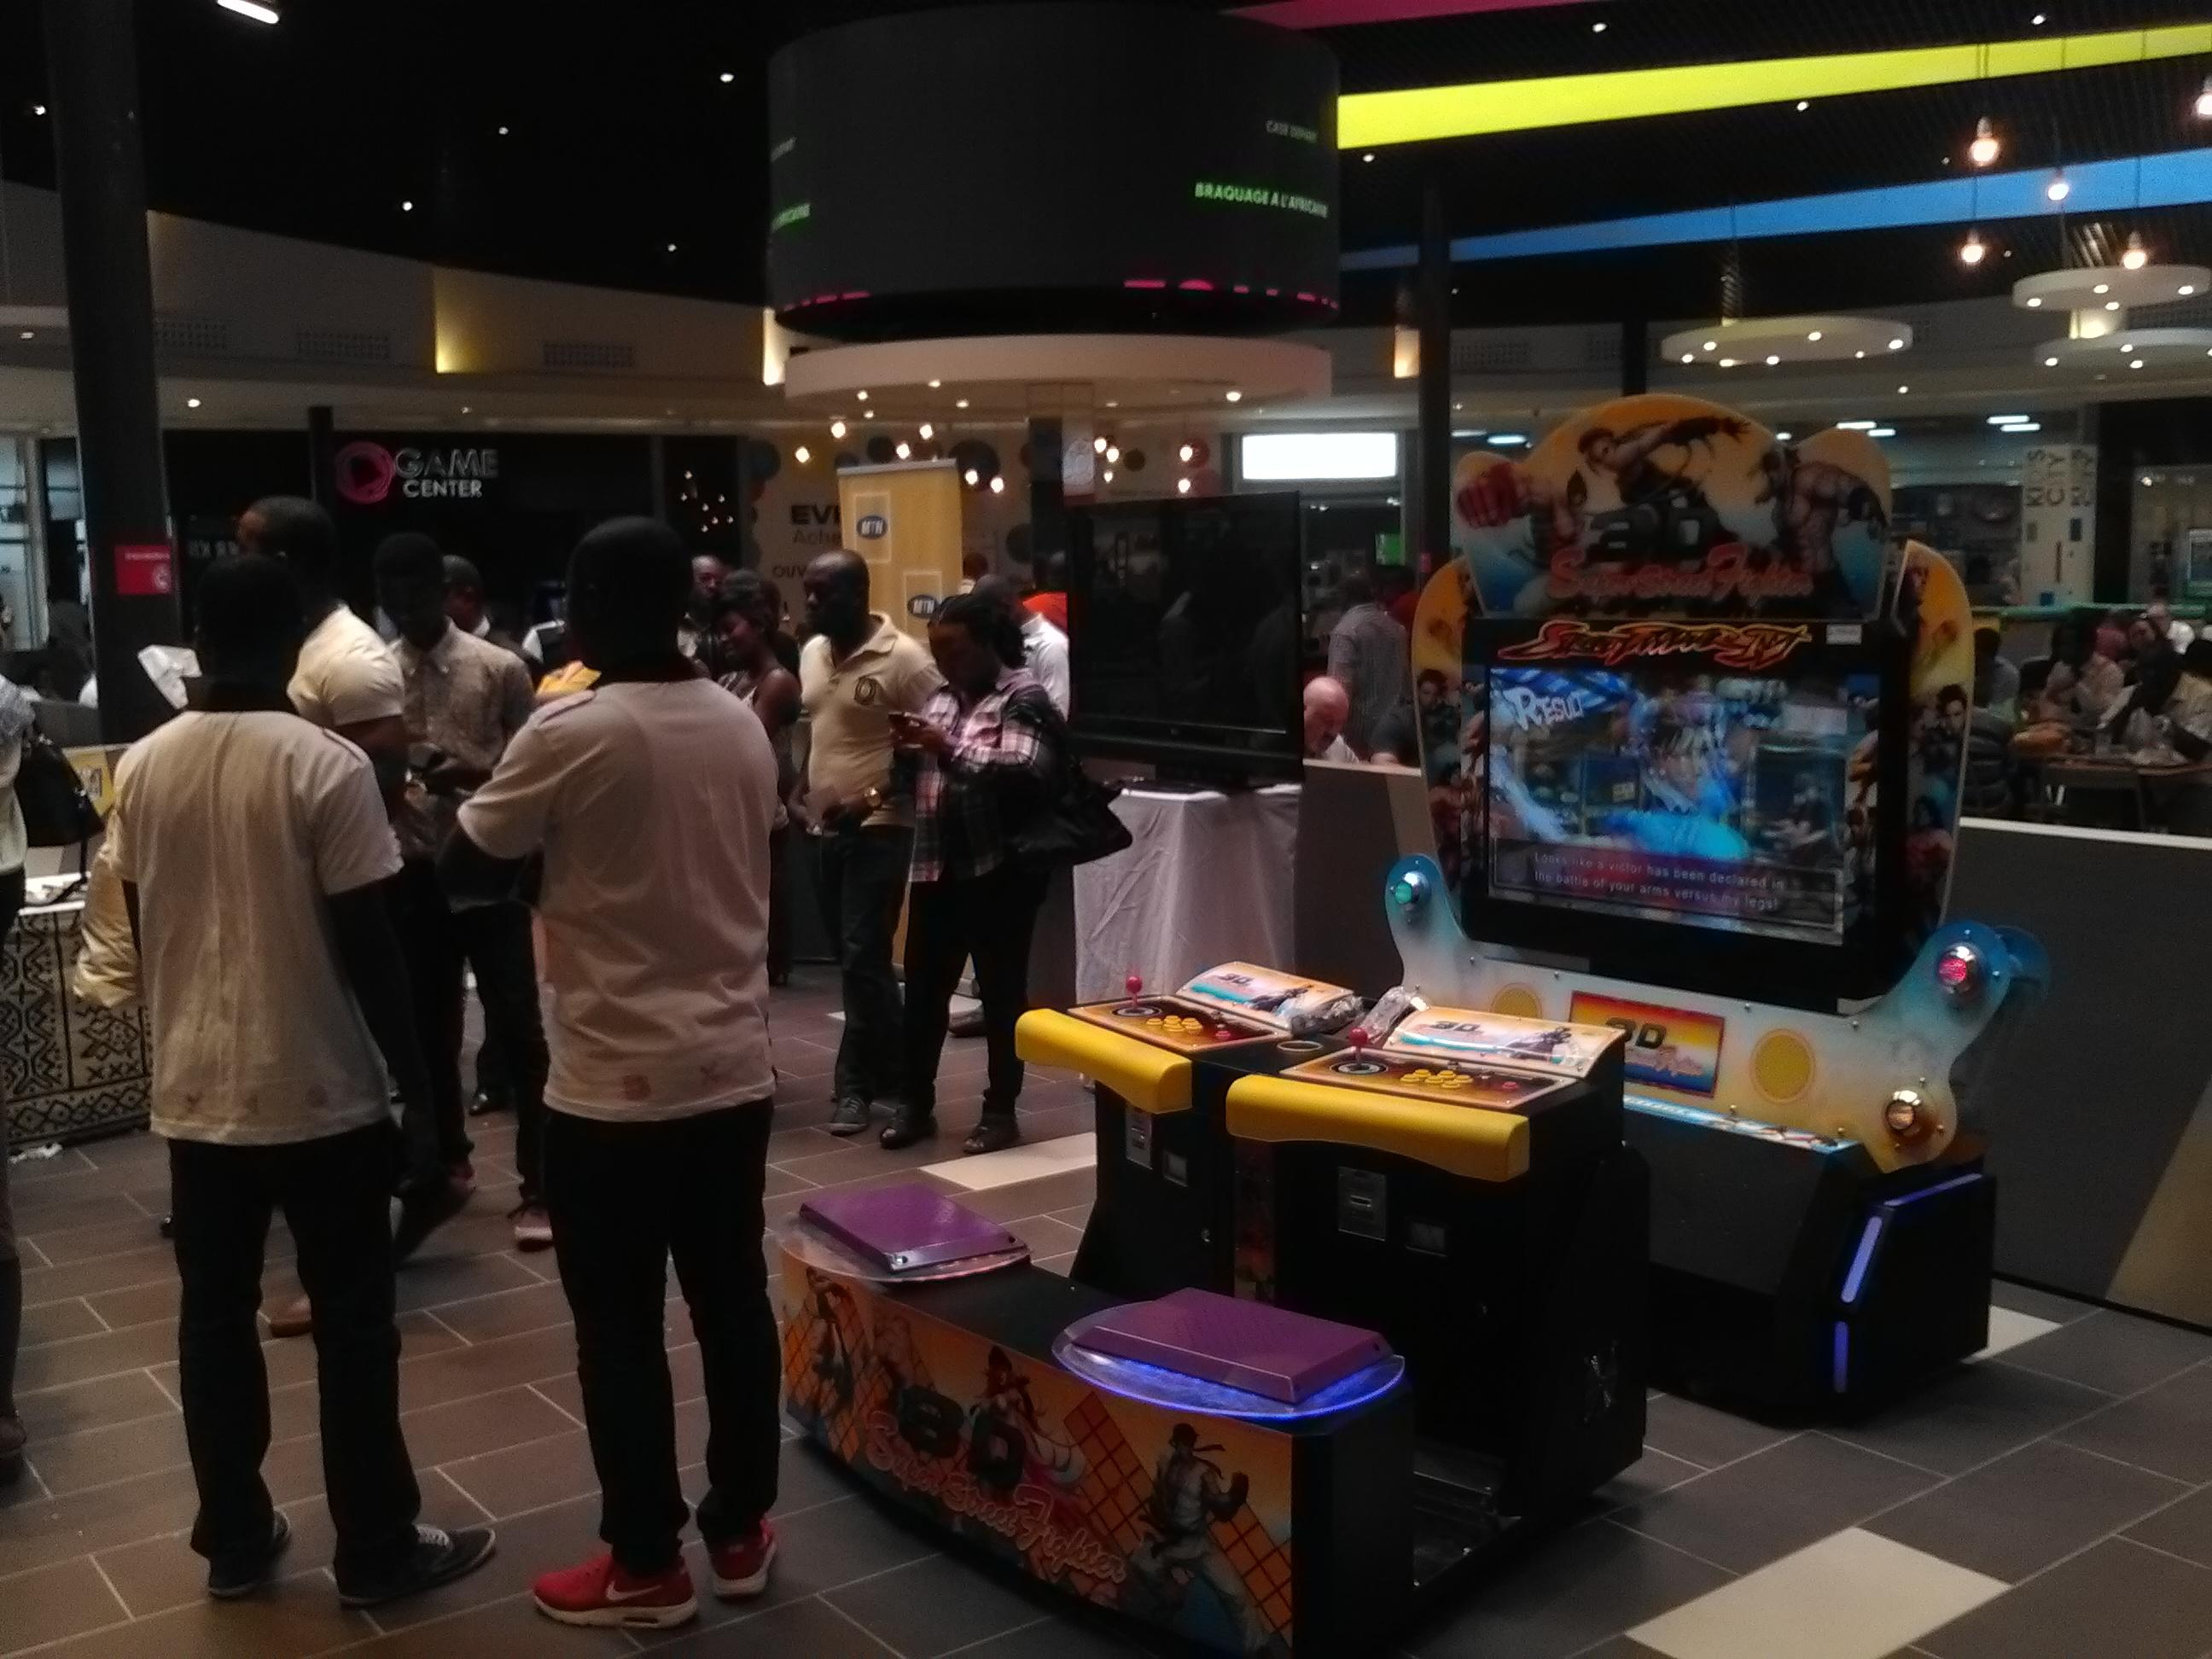 PlaYce Game Center